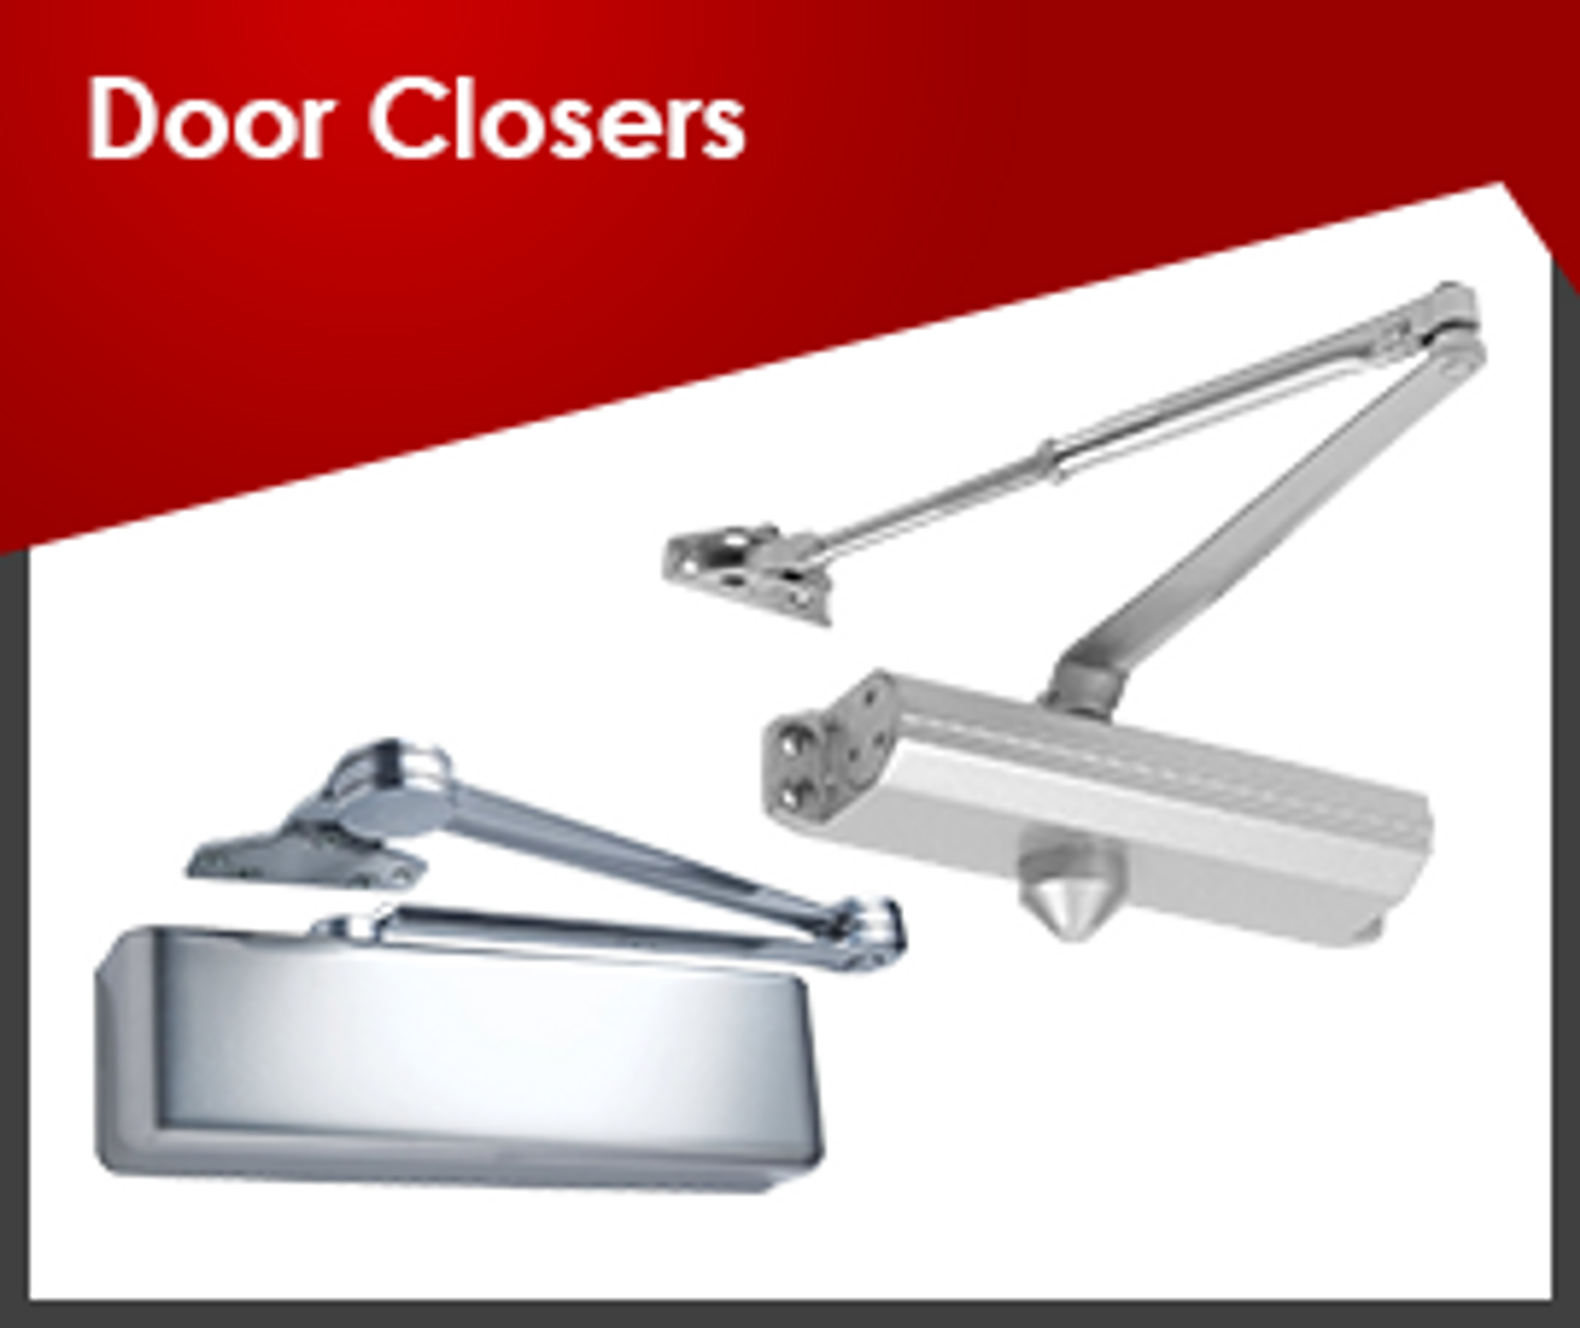 Door Closers and Operators